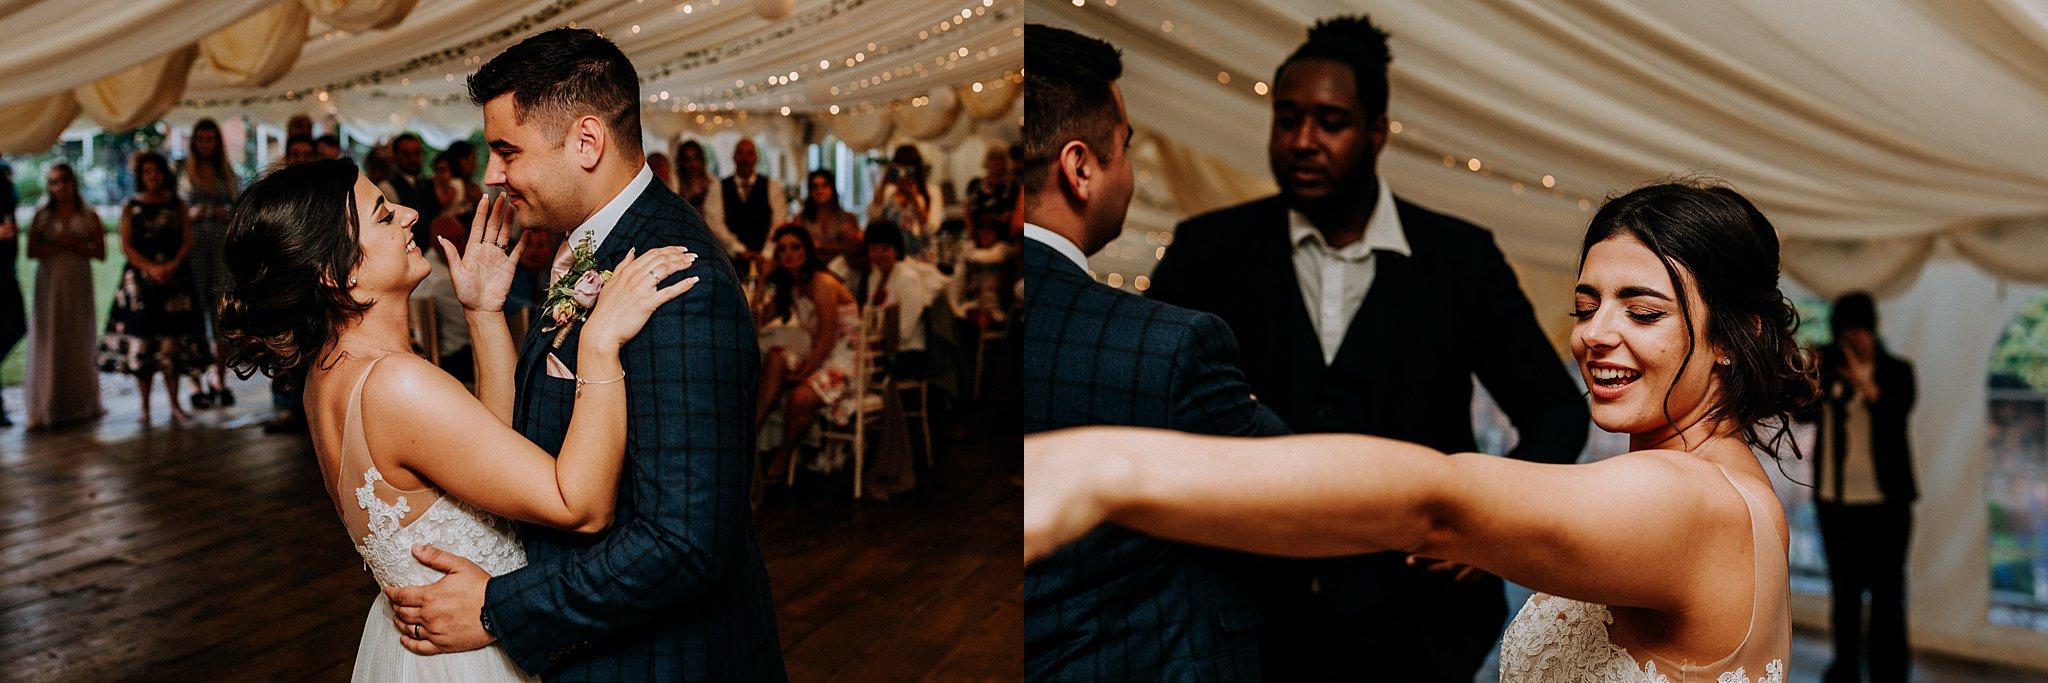 Wedding Photography The Walled Garden